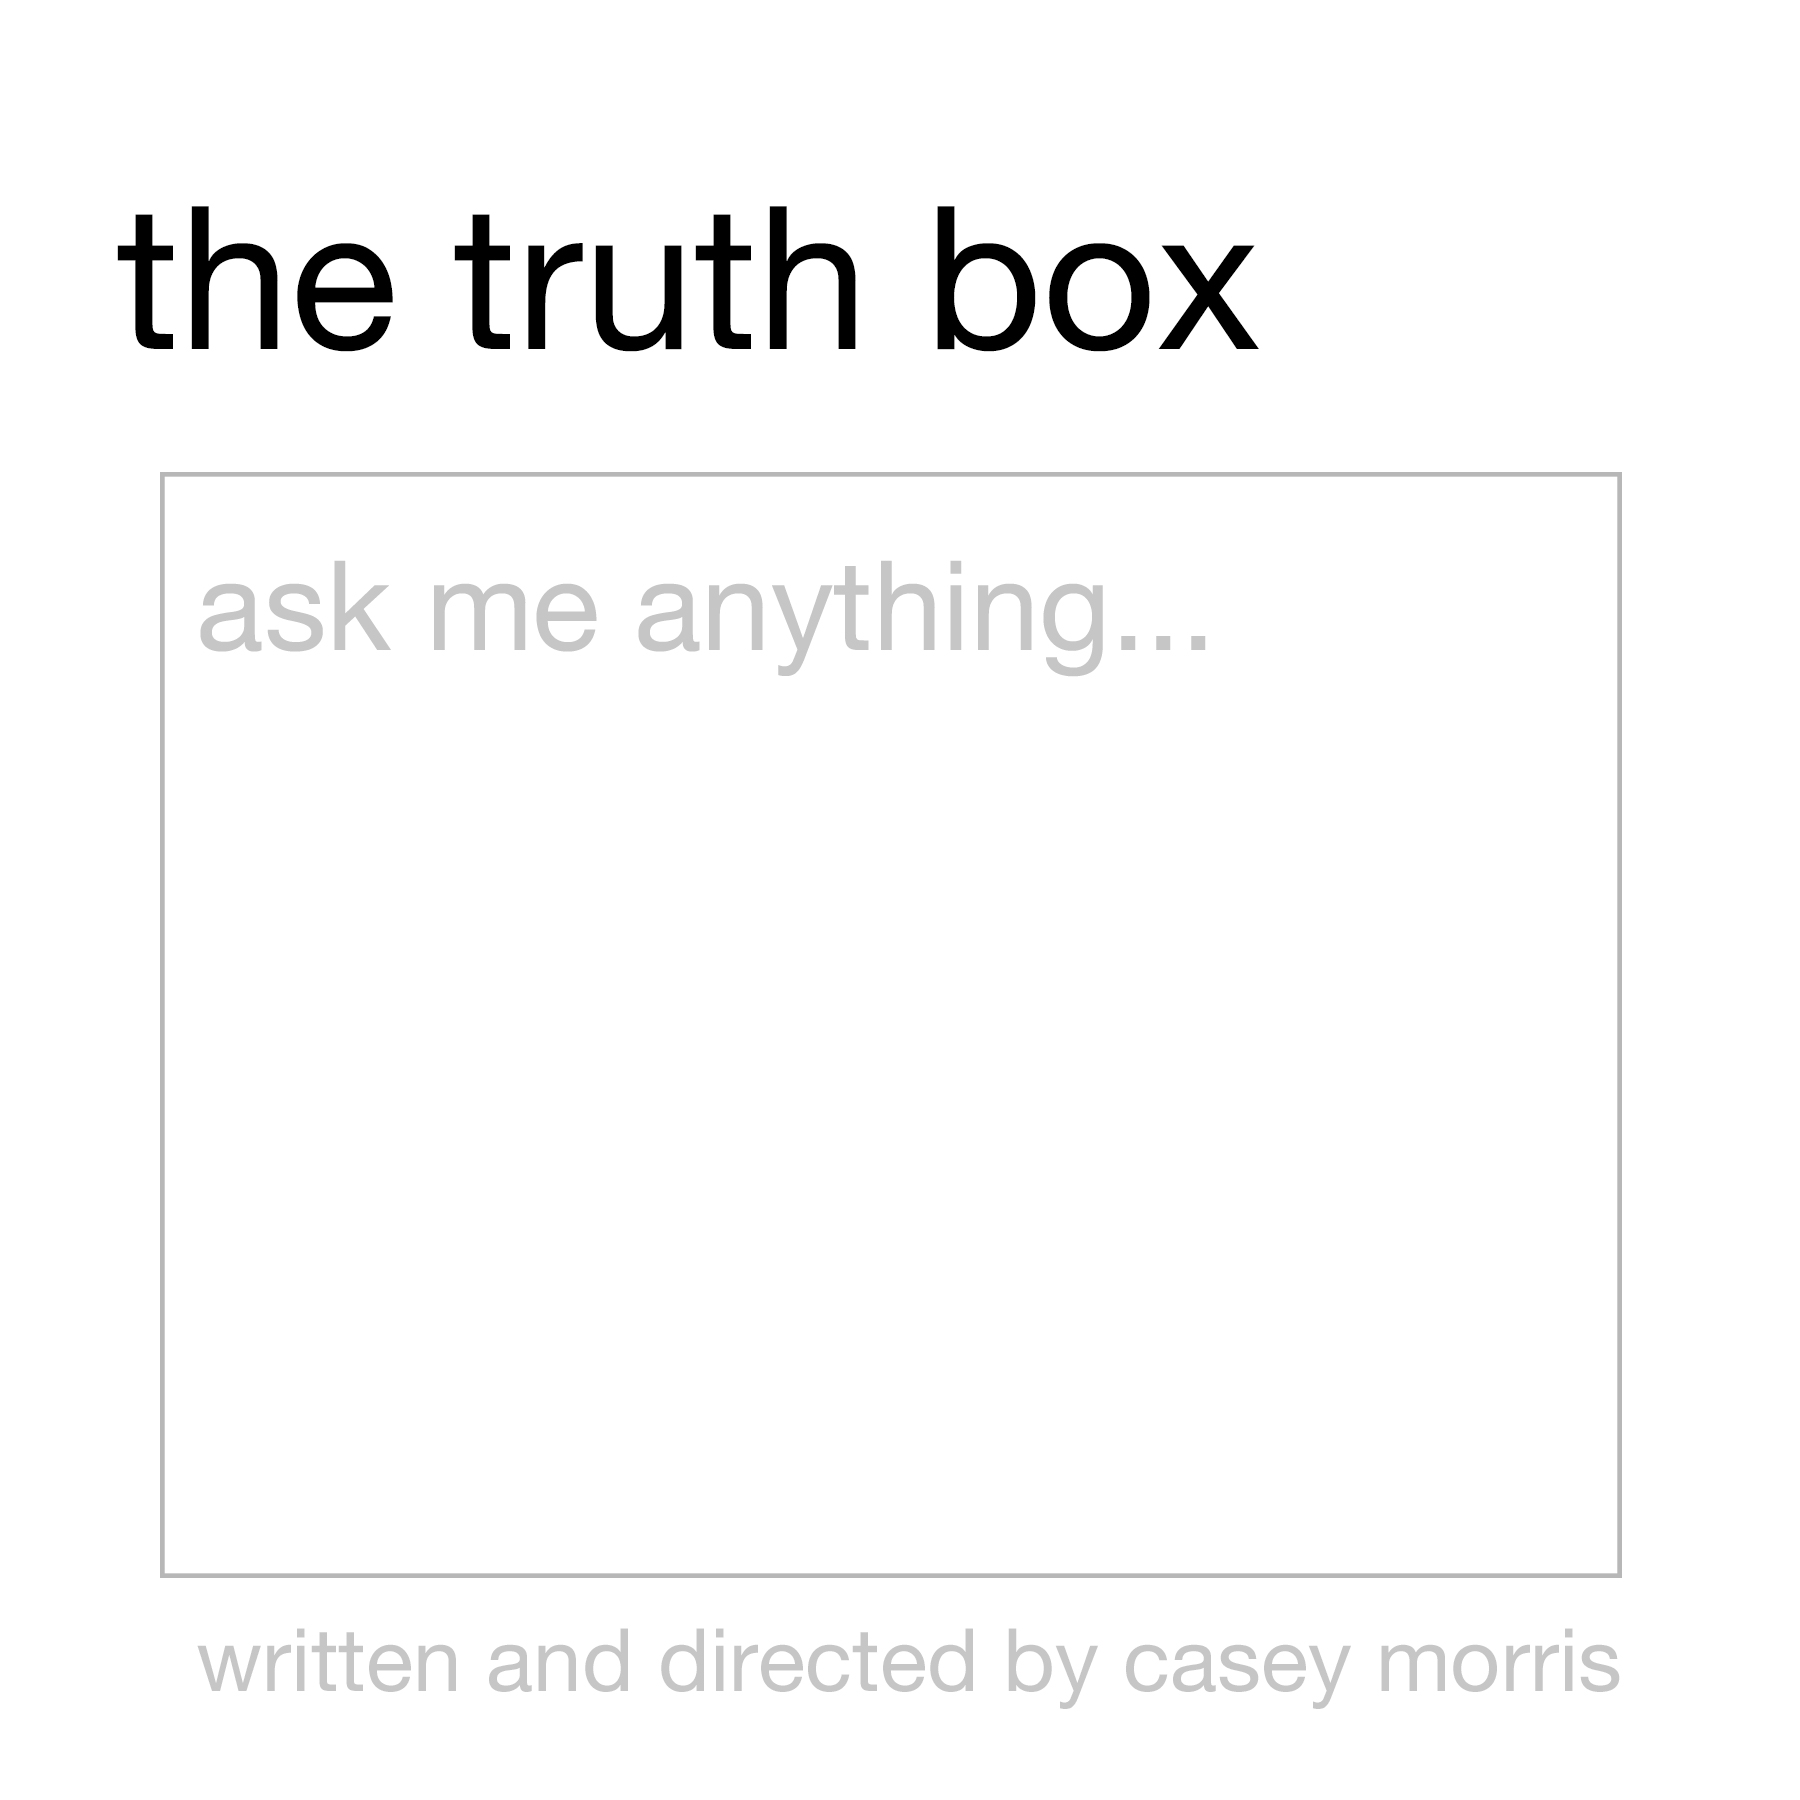 truthbox.jpg